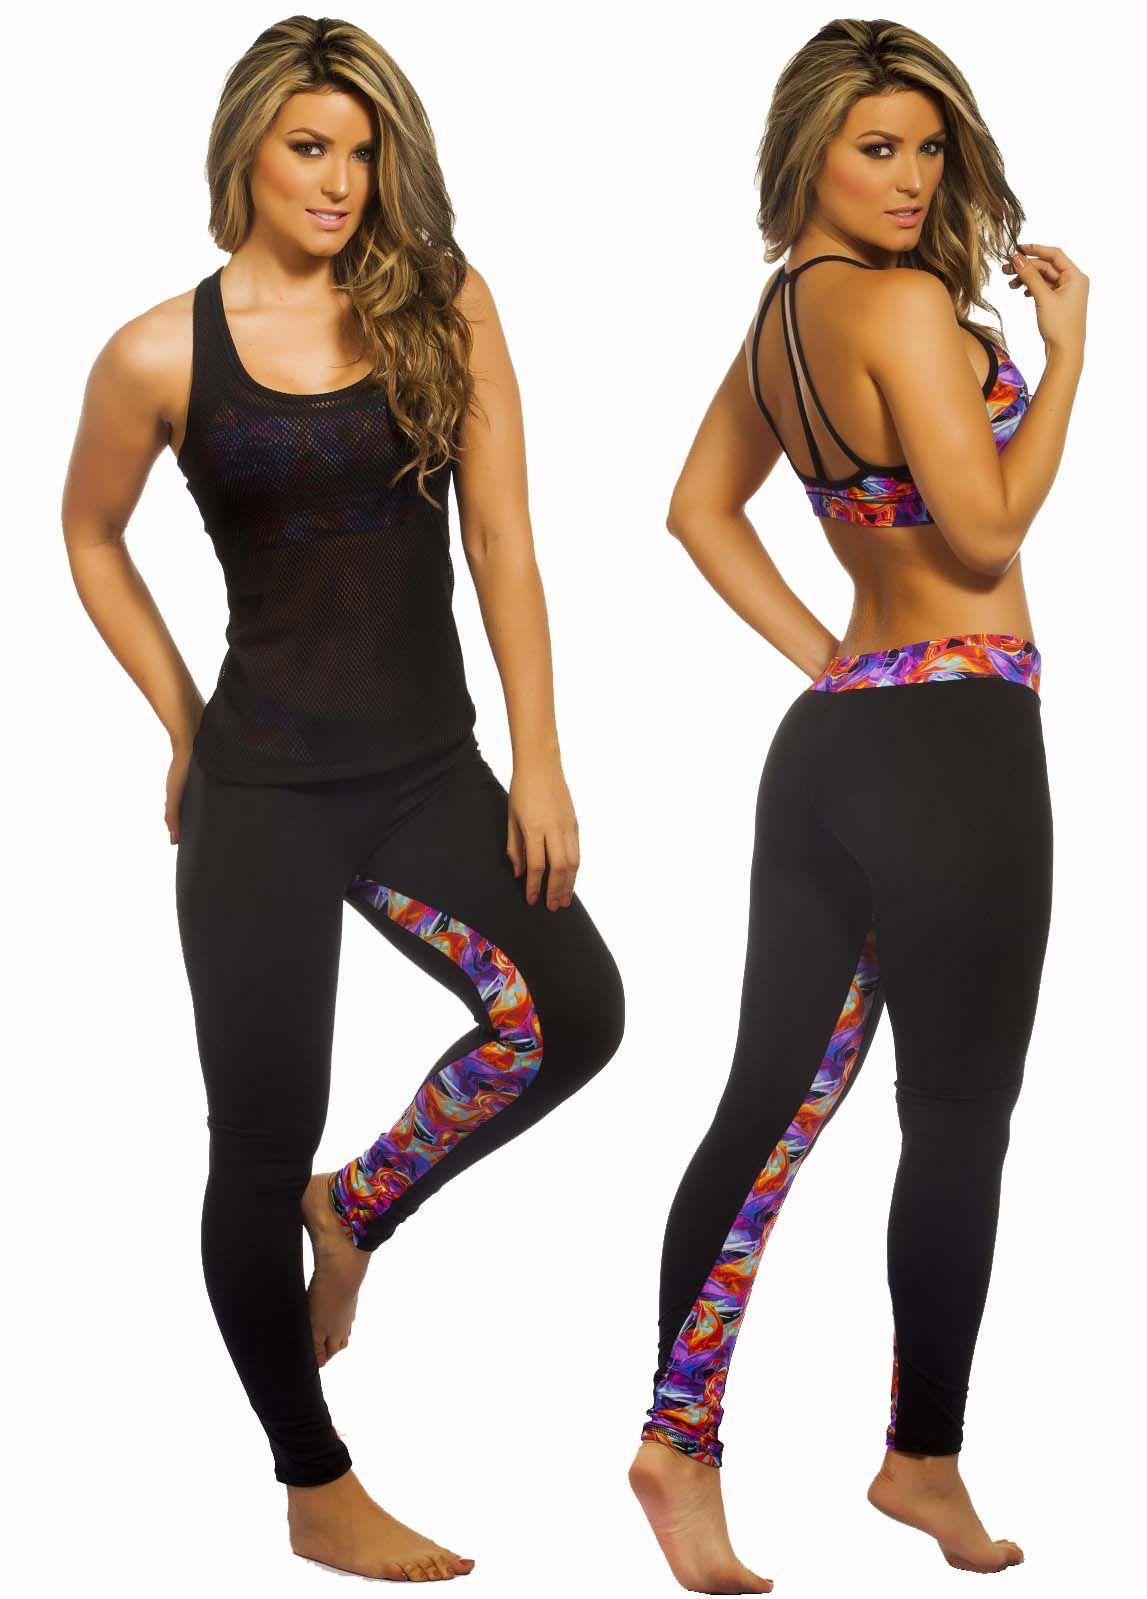 f92eb8333f3f Protokolo 2700 Women Sports Clothing Gym Activewear Fitness Apparel ...